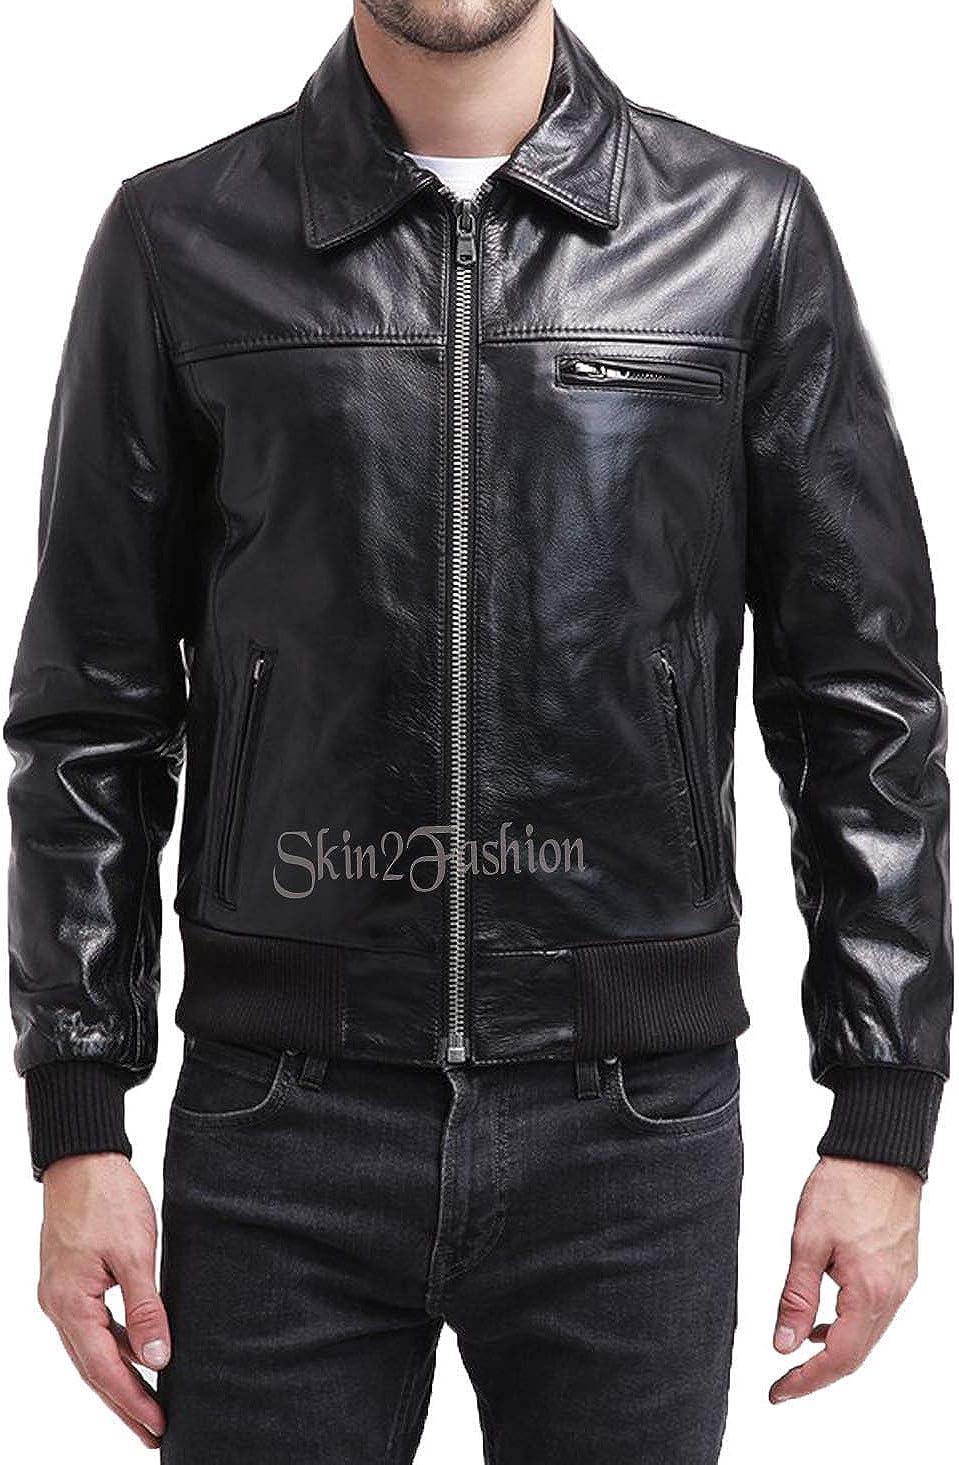 Skin2Fashion Mens Leather Jackets 274